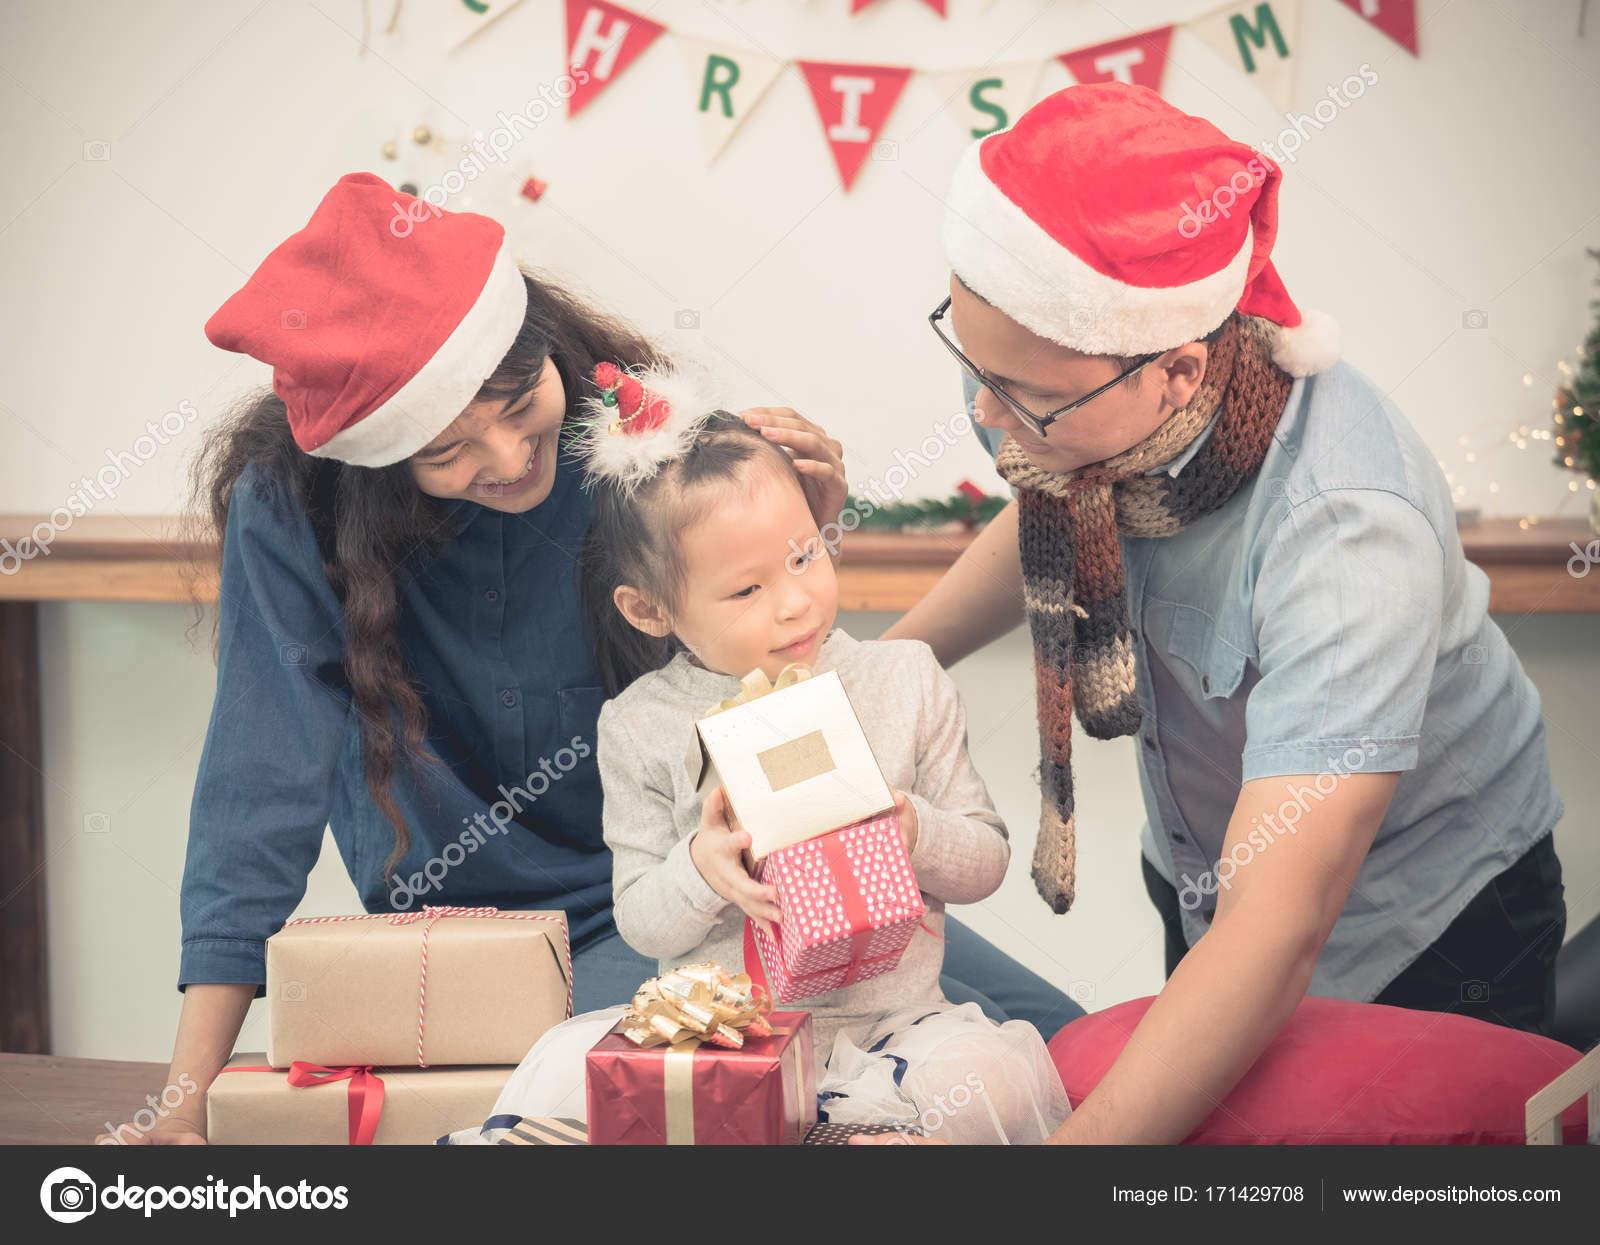 Gelukkige familie asia familie slijtage kerstman hoed uitpakken